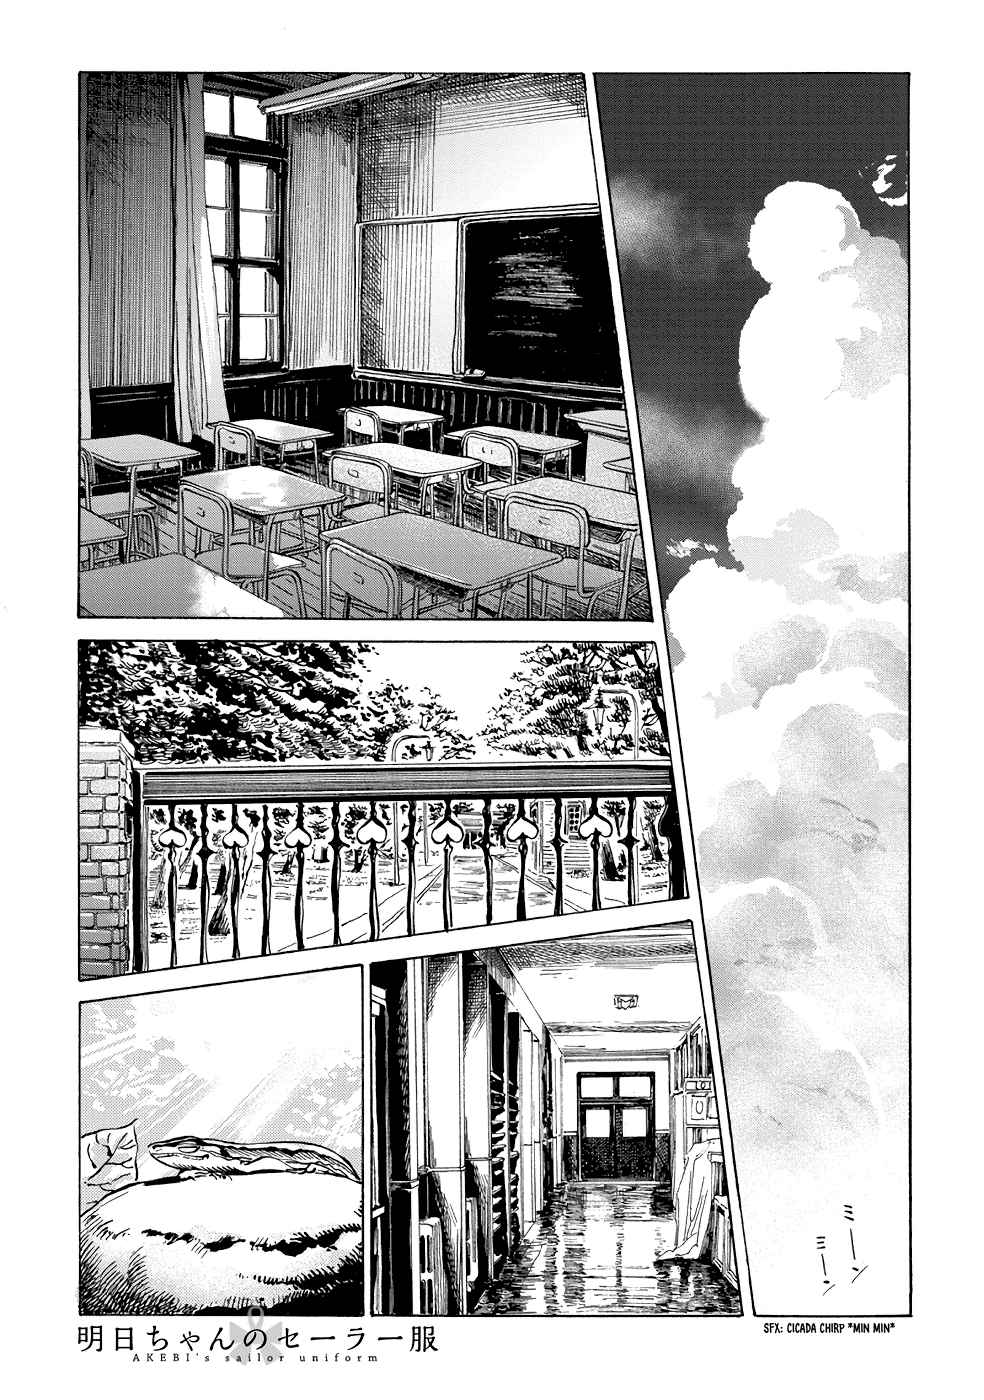 https://manga.mangadogs.com/comics/pic4/36/18532/1894106/2810533f3e8335c1e5842e38a66e2d41.jpg Page 1